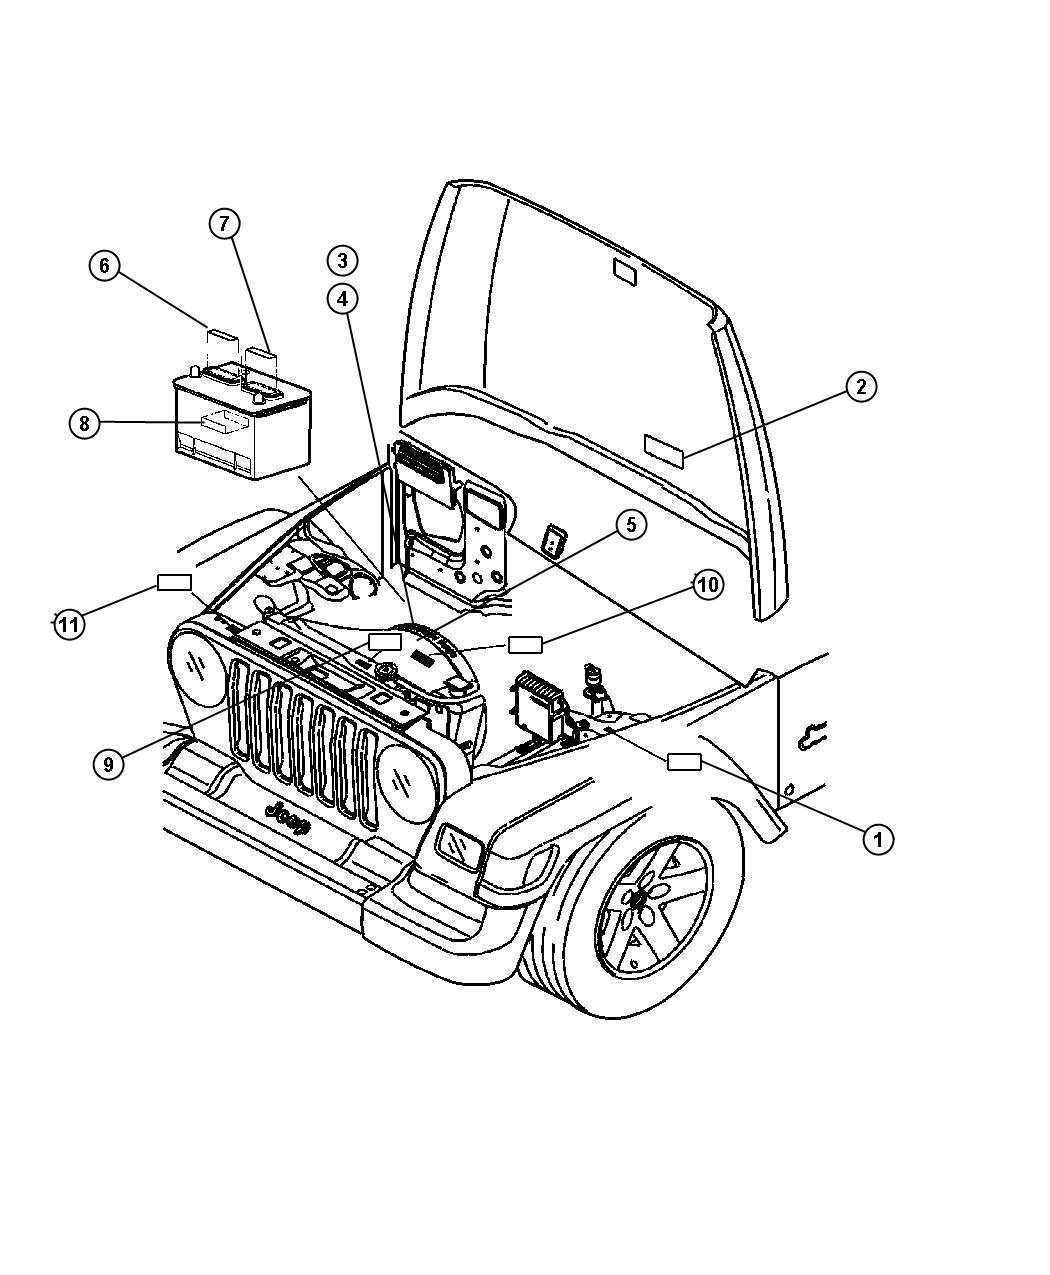 Jeep Wrangler 4 0 Engine Diagram